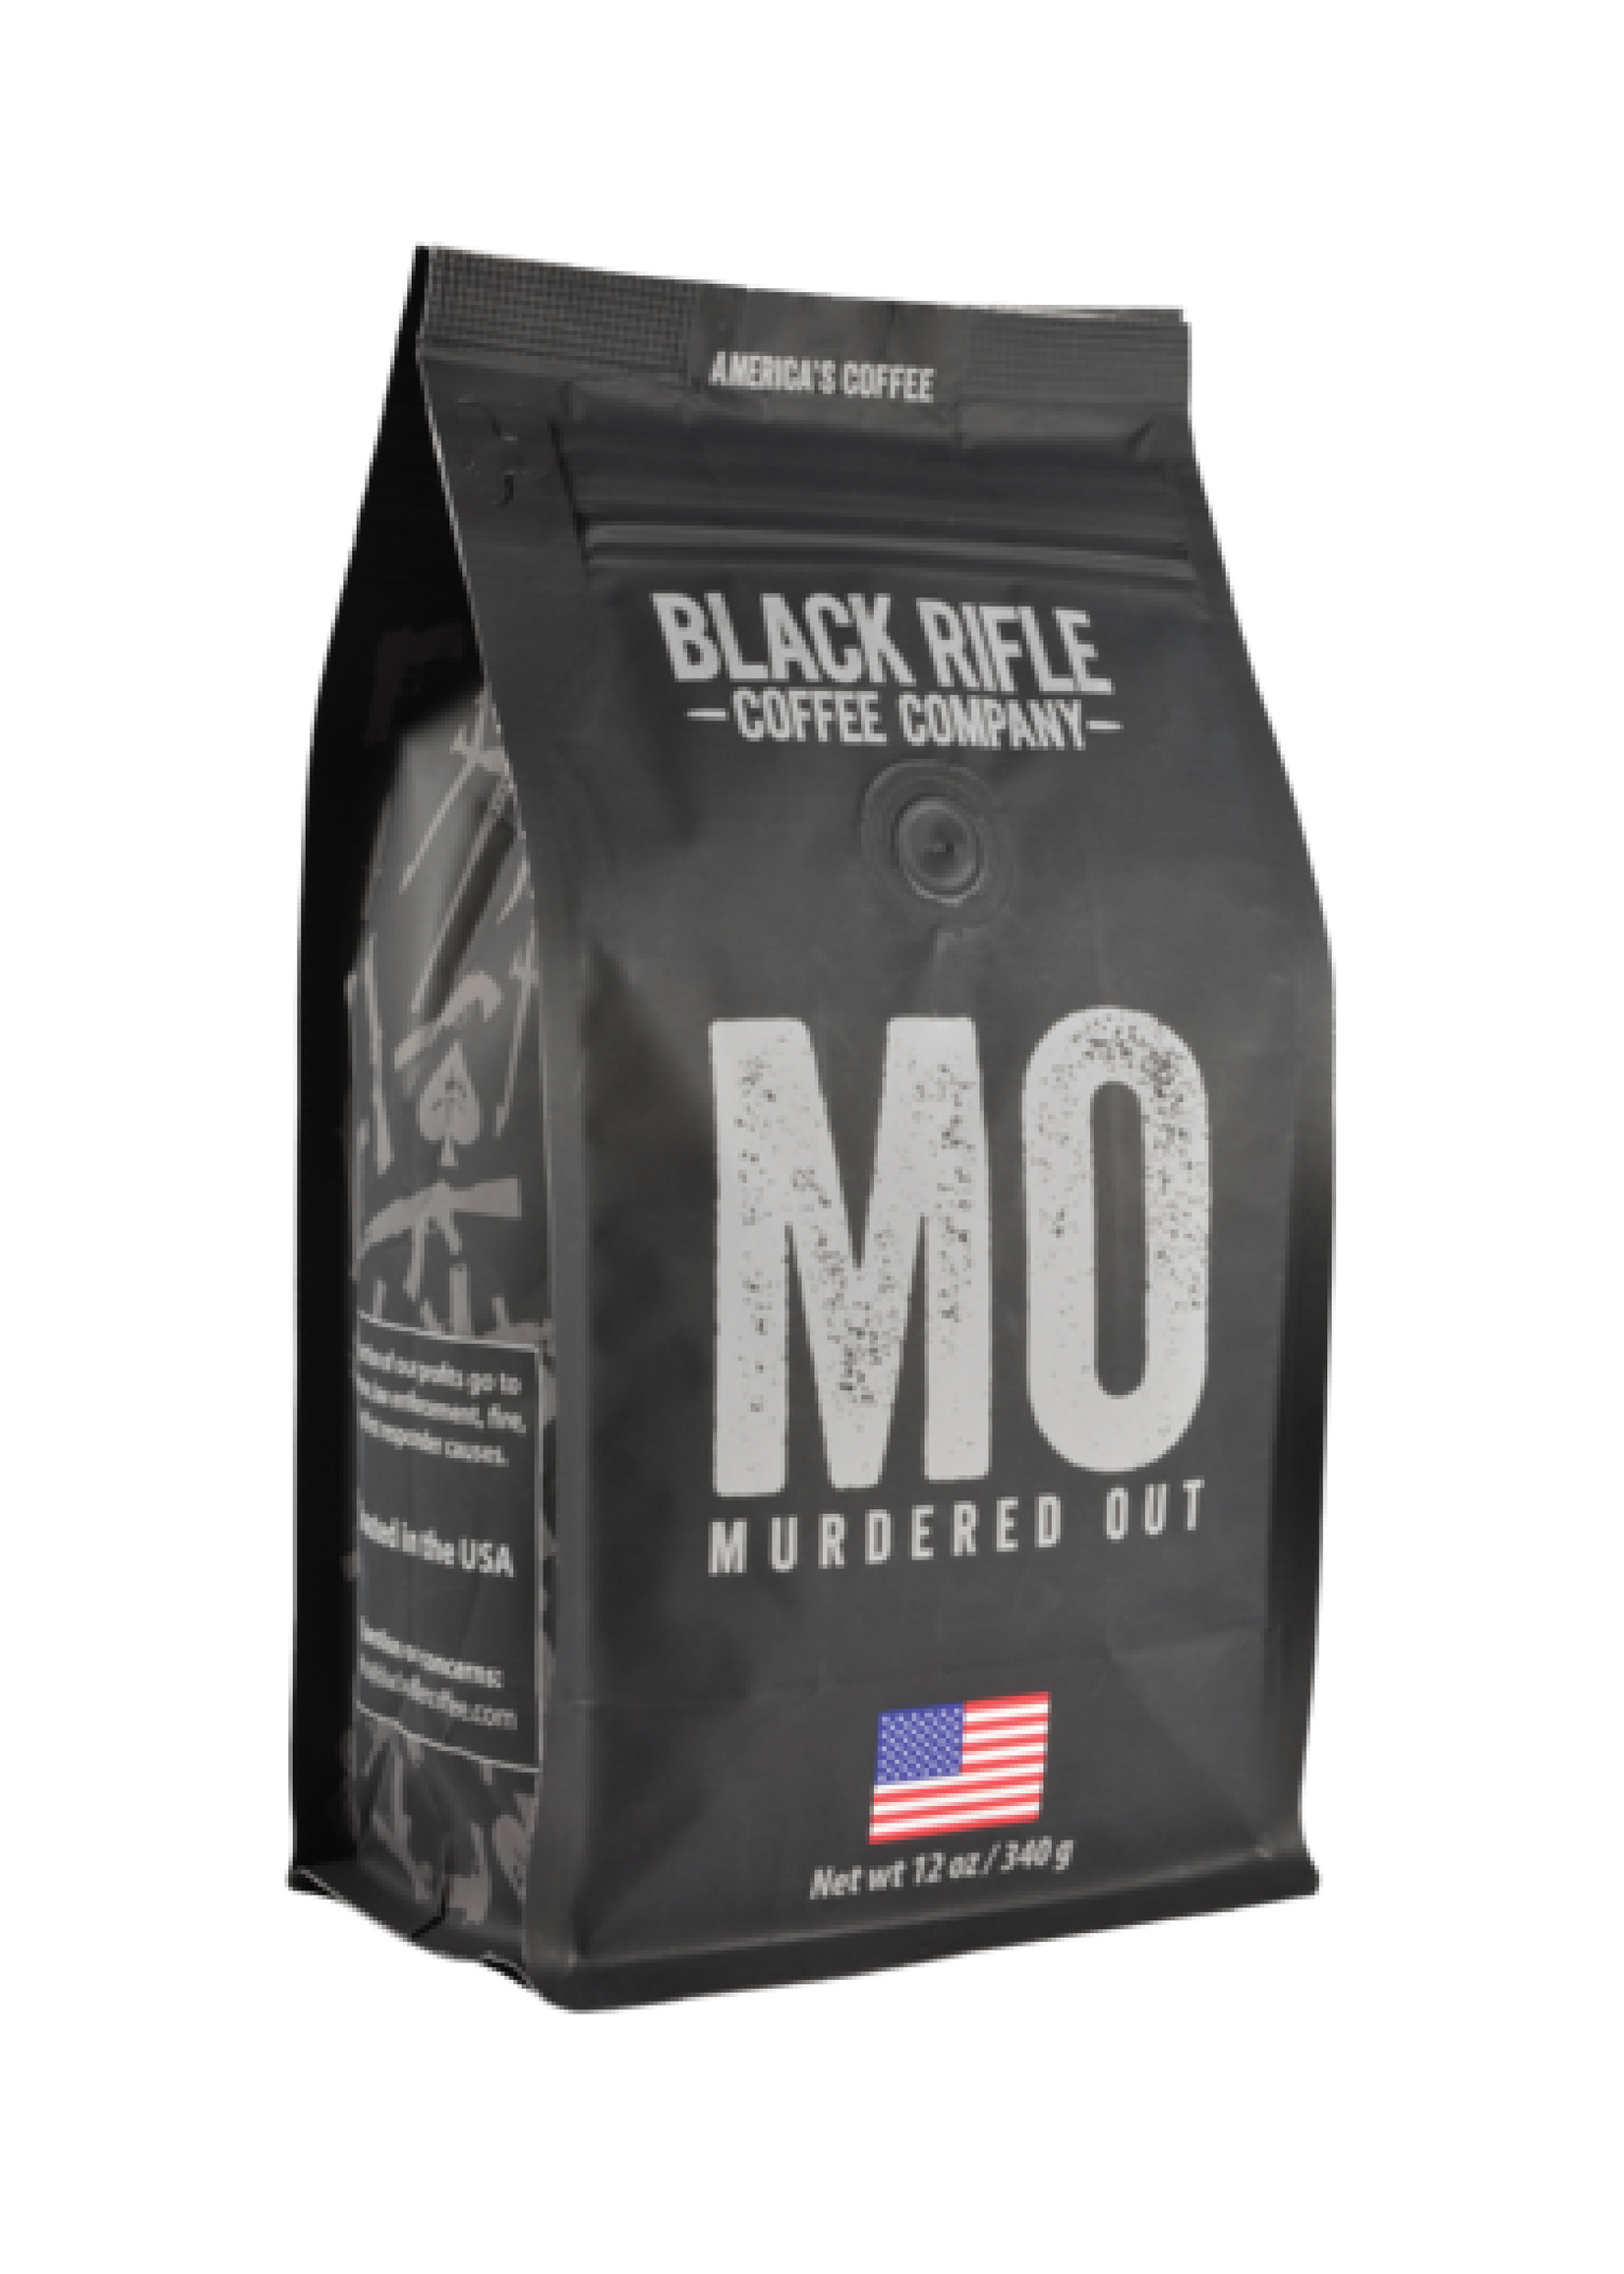 Black Rifle Coffee Company Black Rifle Coffee Company Murdered Out Coffee Roast Whole Bean